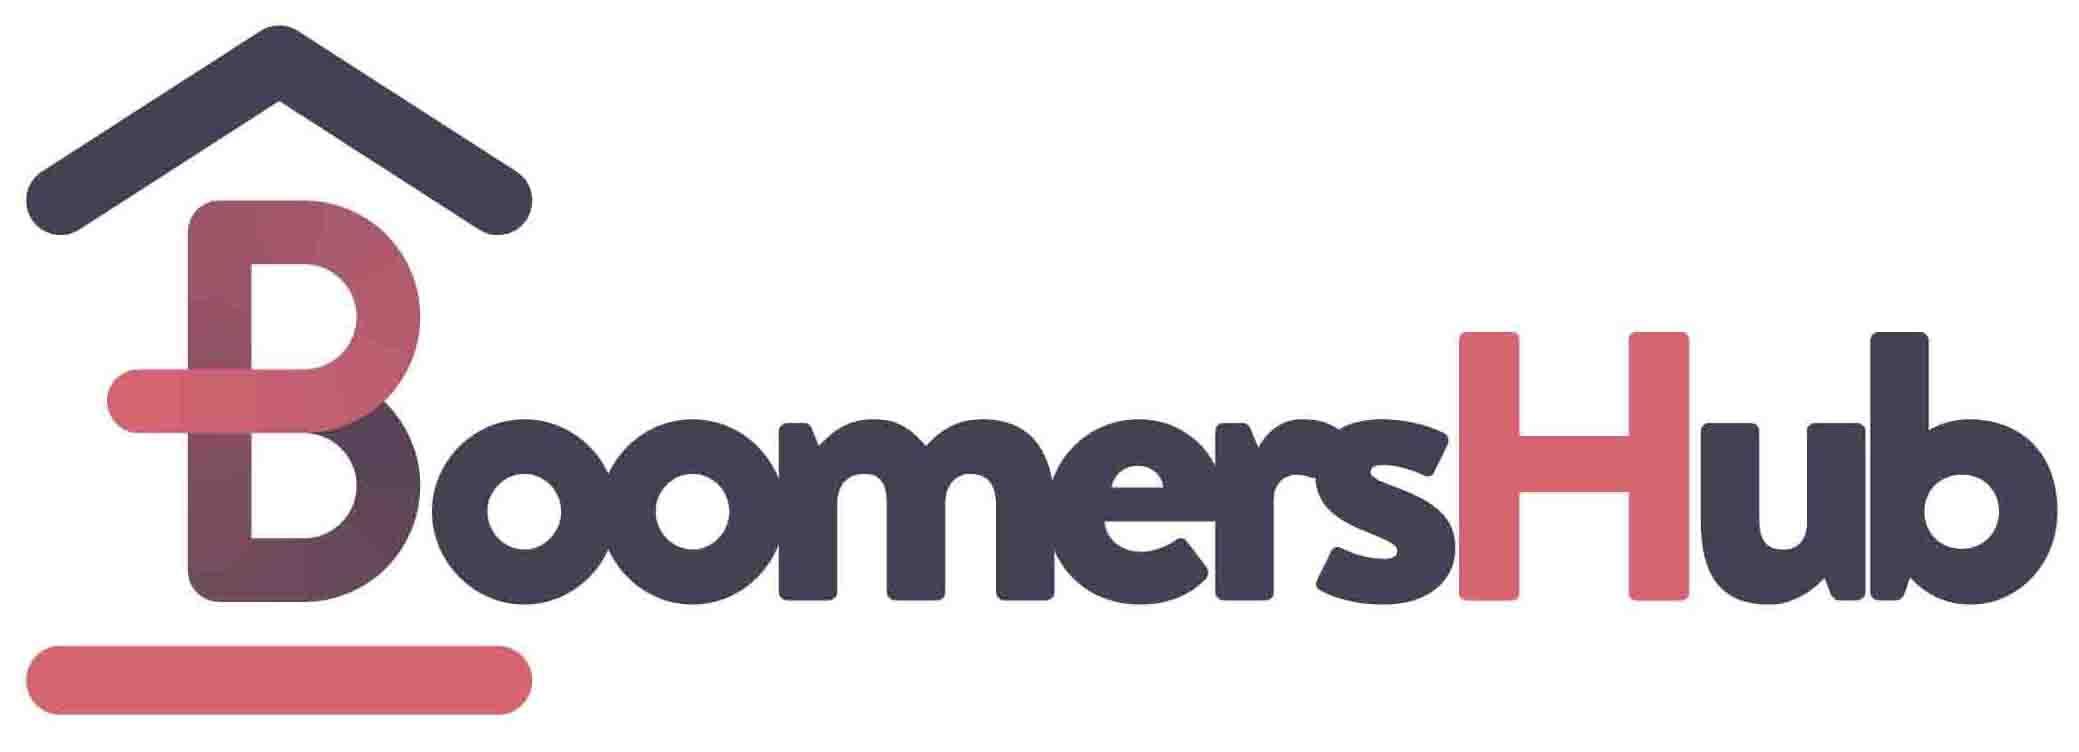 Boomershub logo